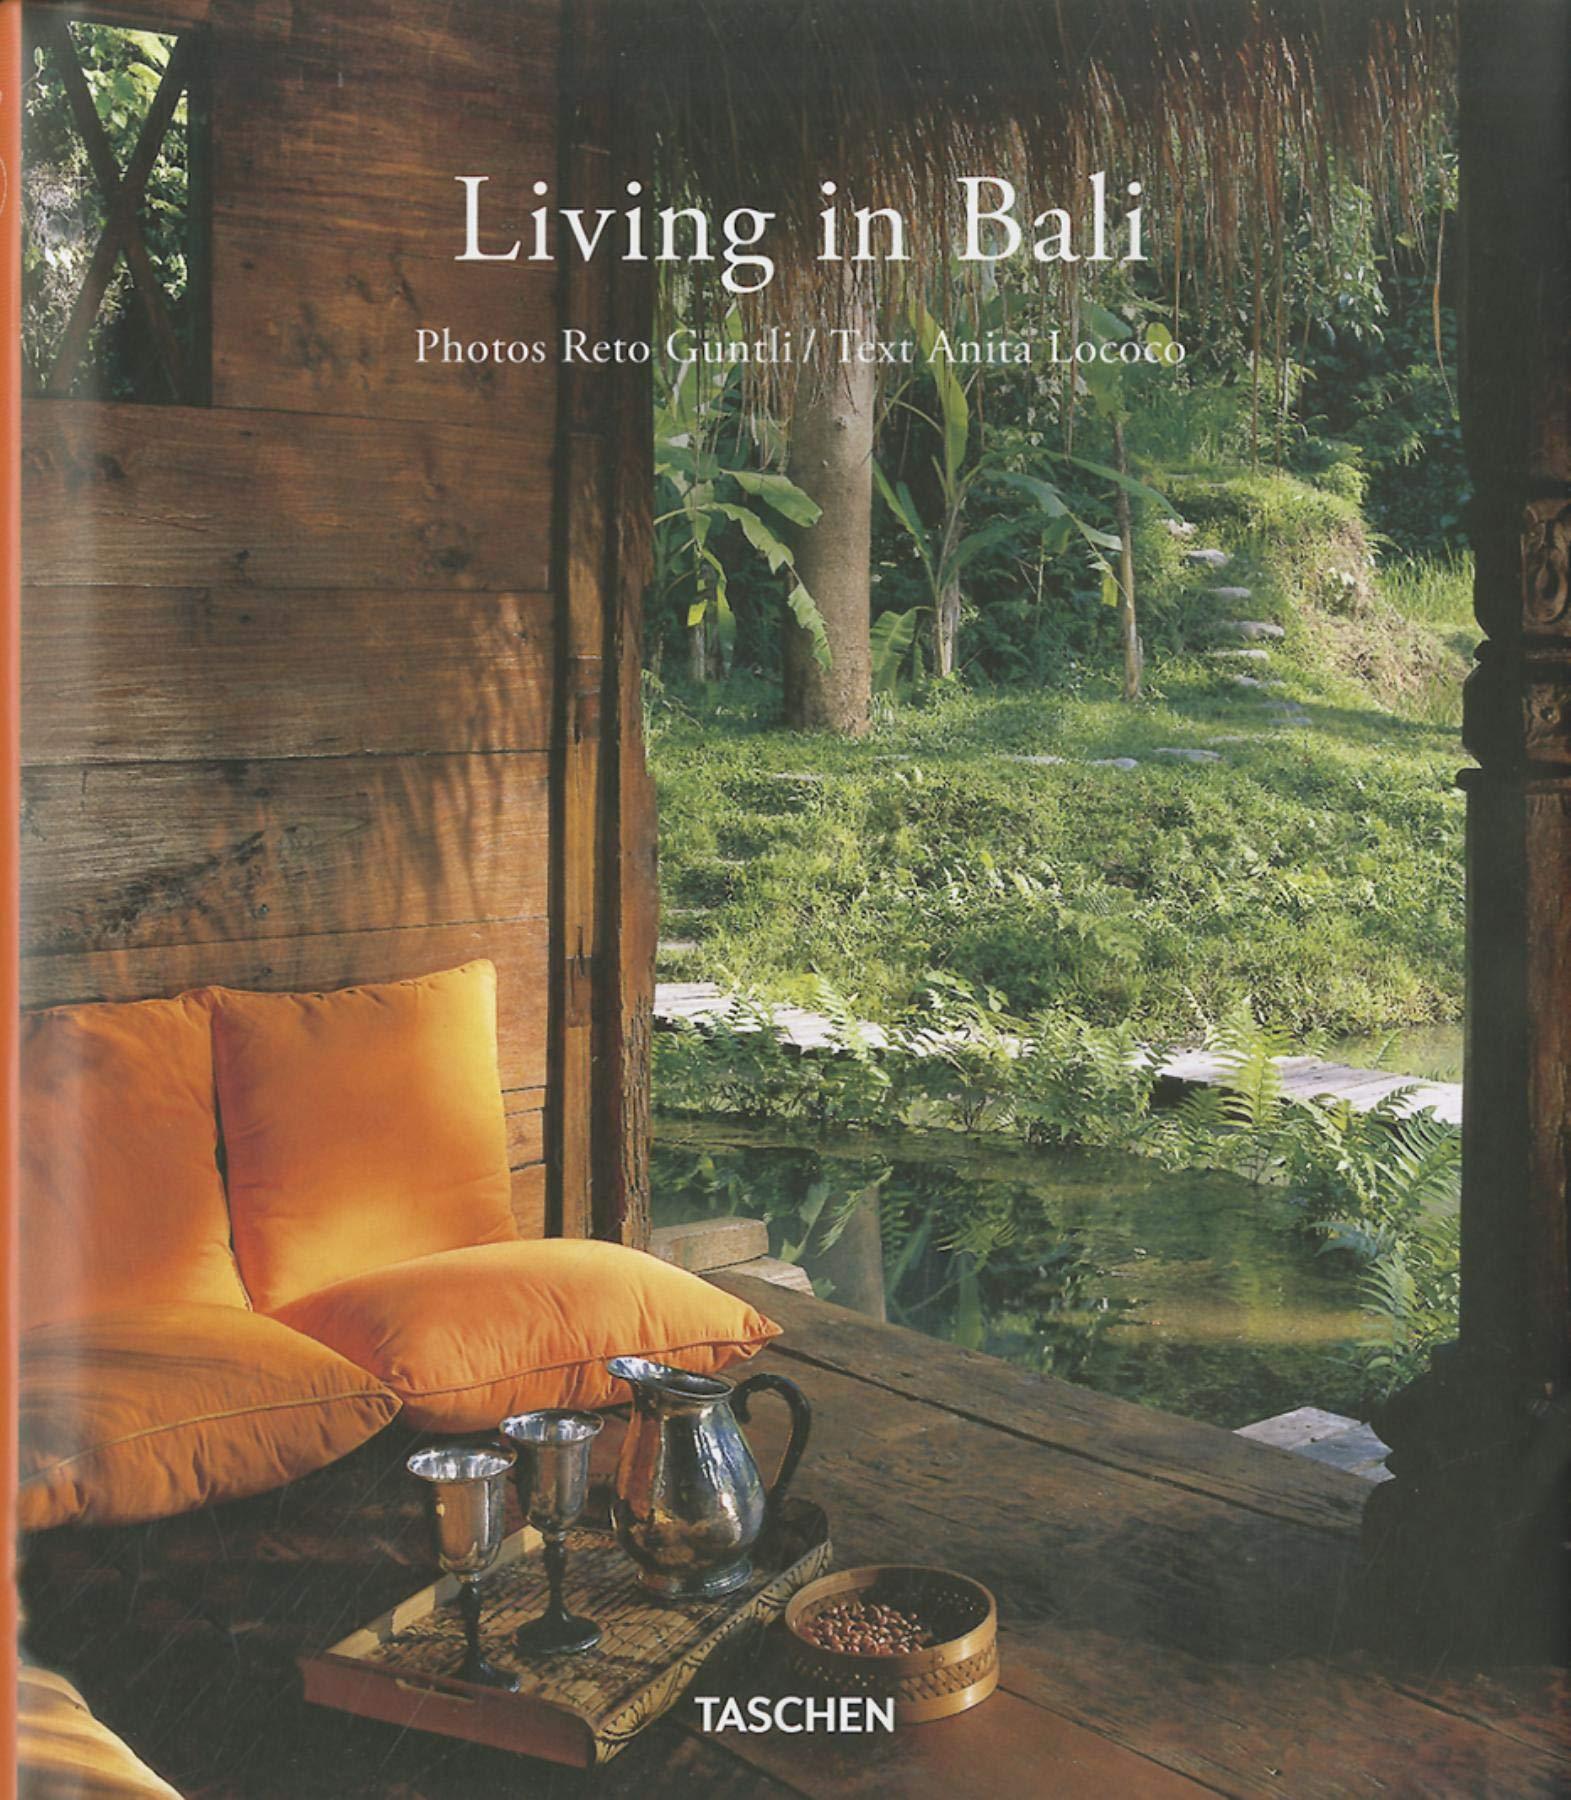 Bali Home Design Ideas: Bali Home Designs